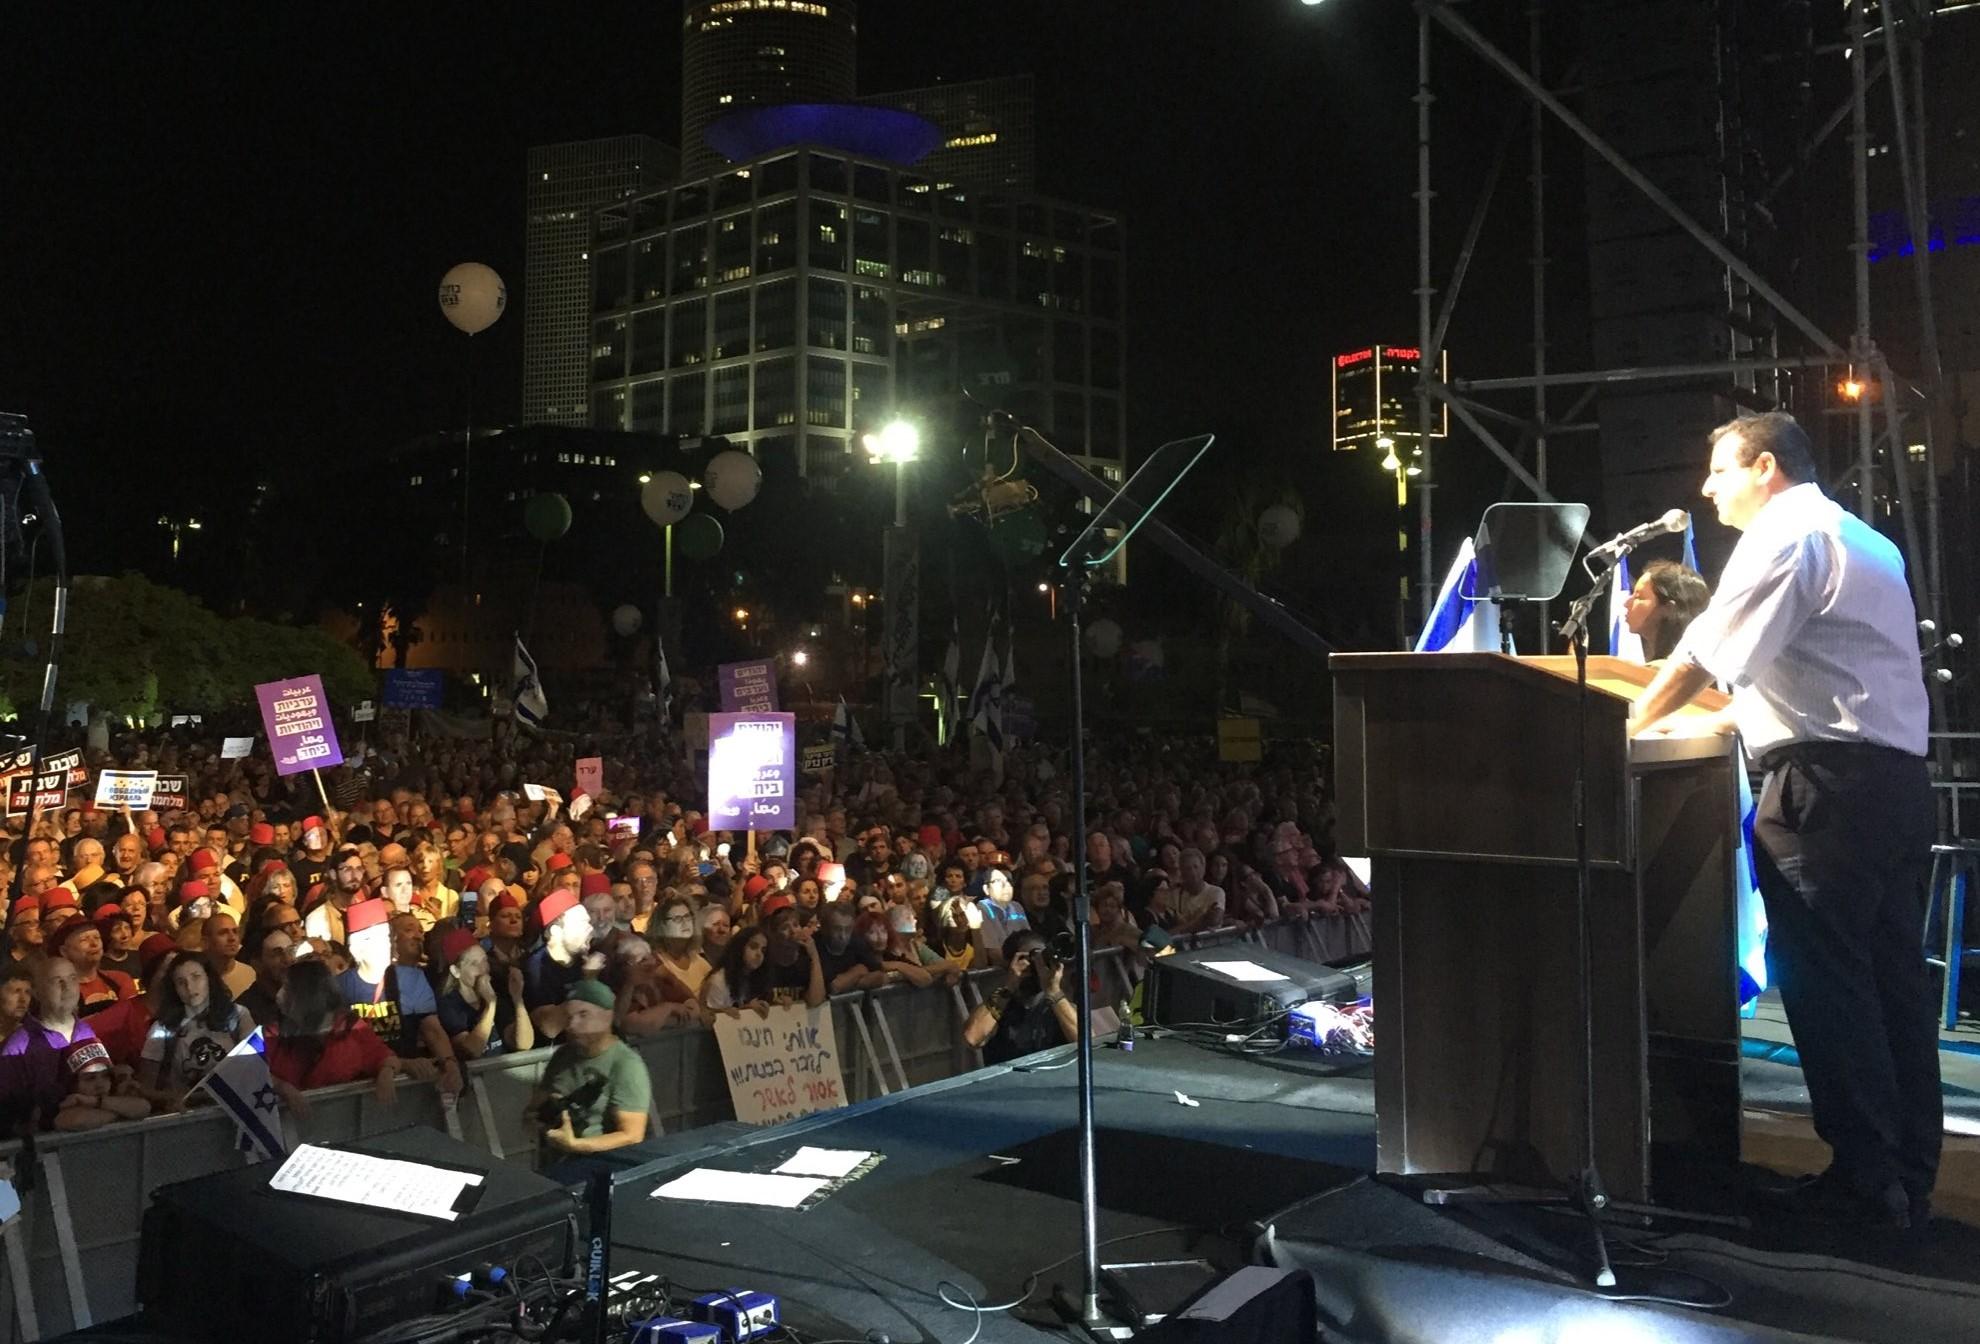 MK Ayman Odeh addresses the mass of demonstrators on Saturday night, May 25, in Tel Aviv.